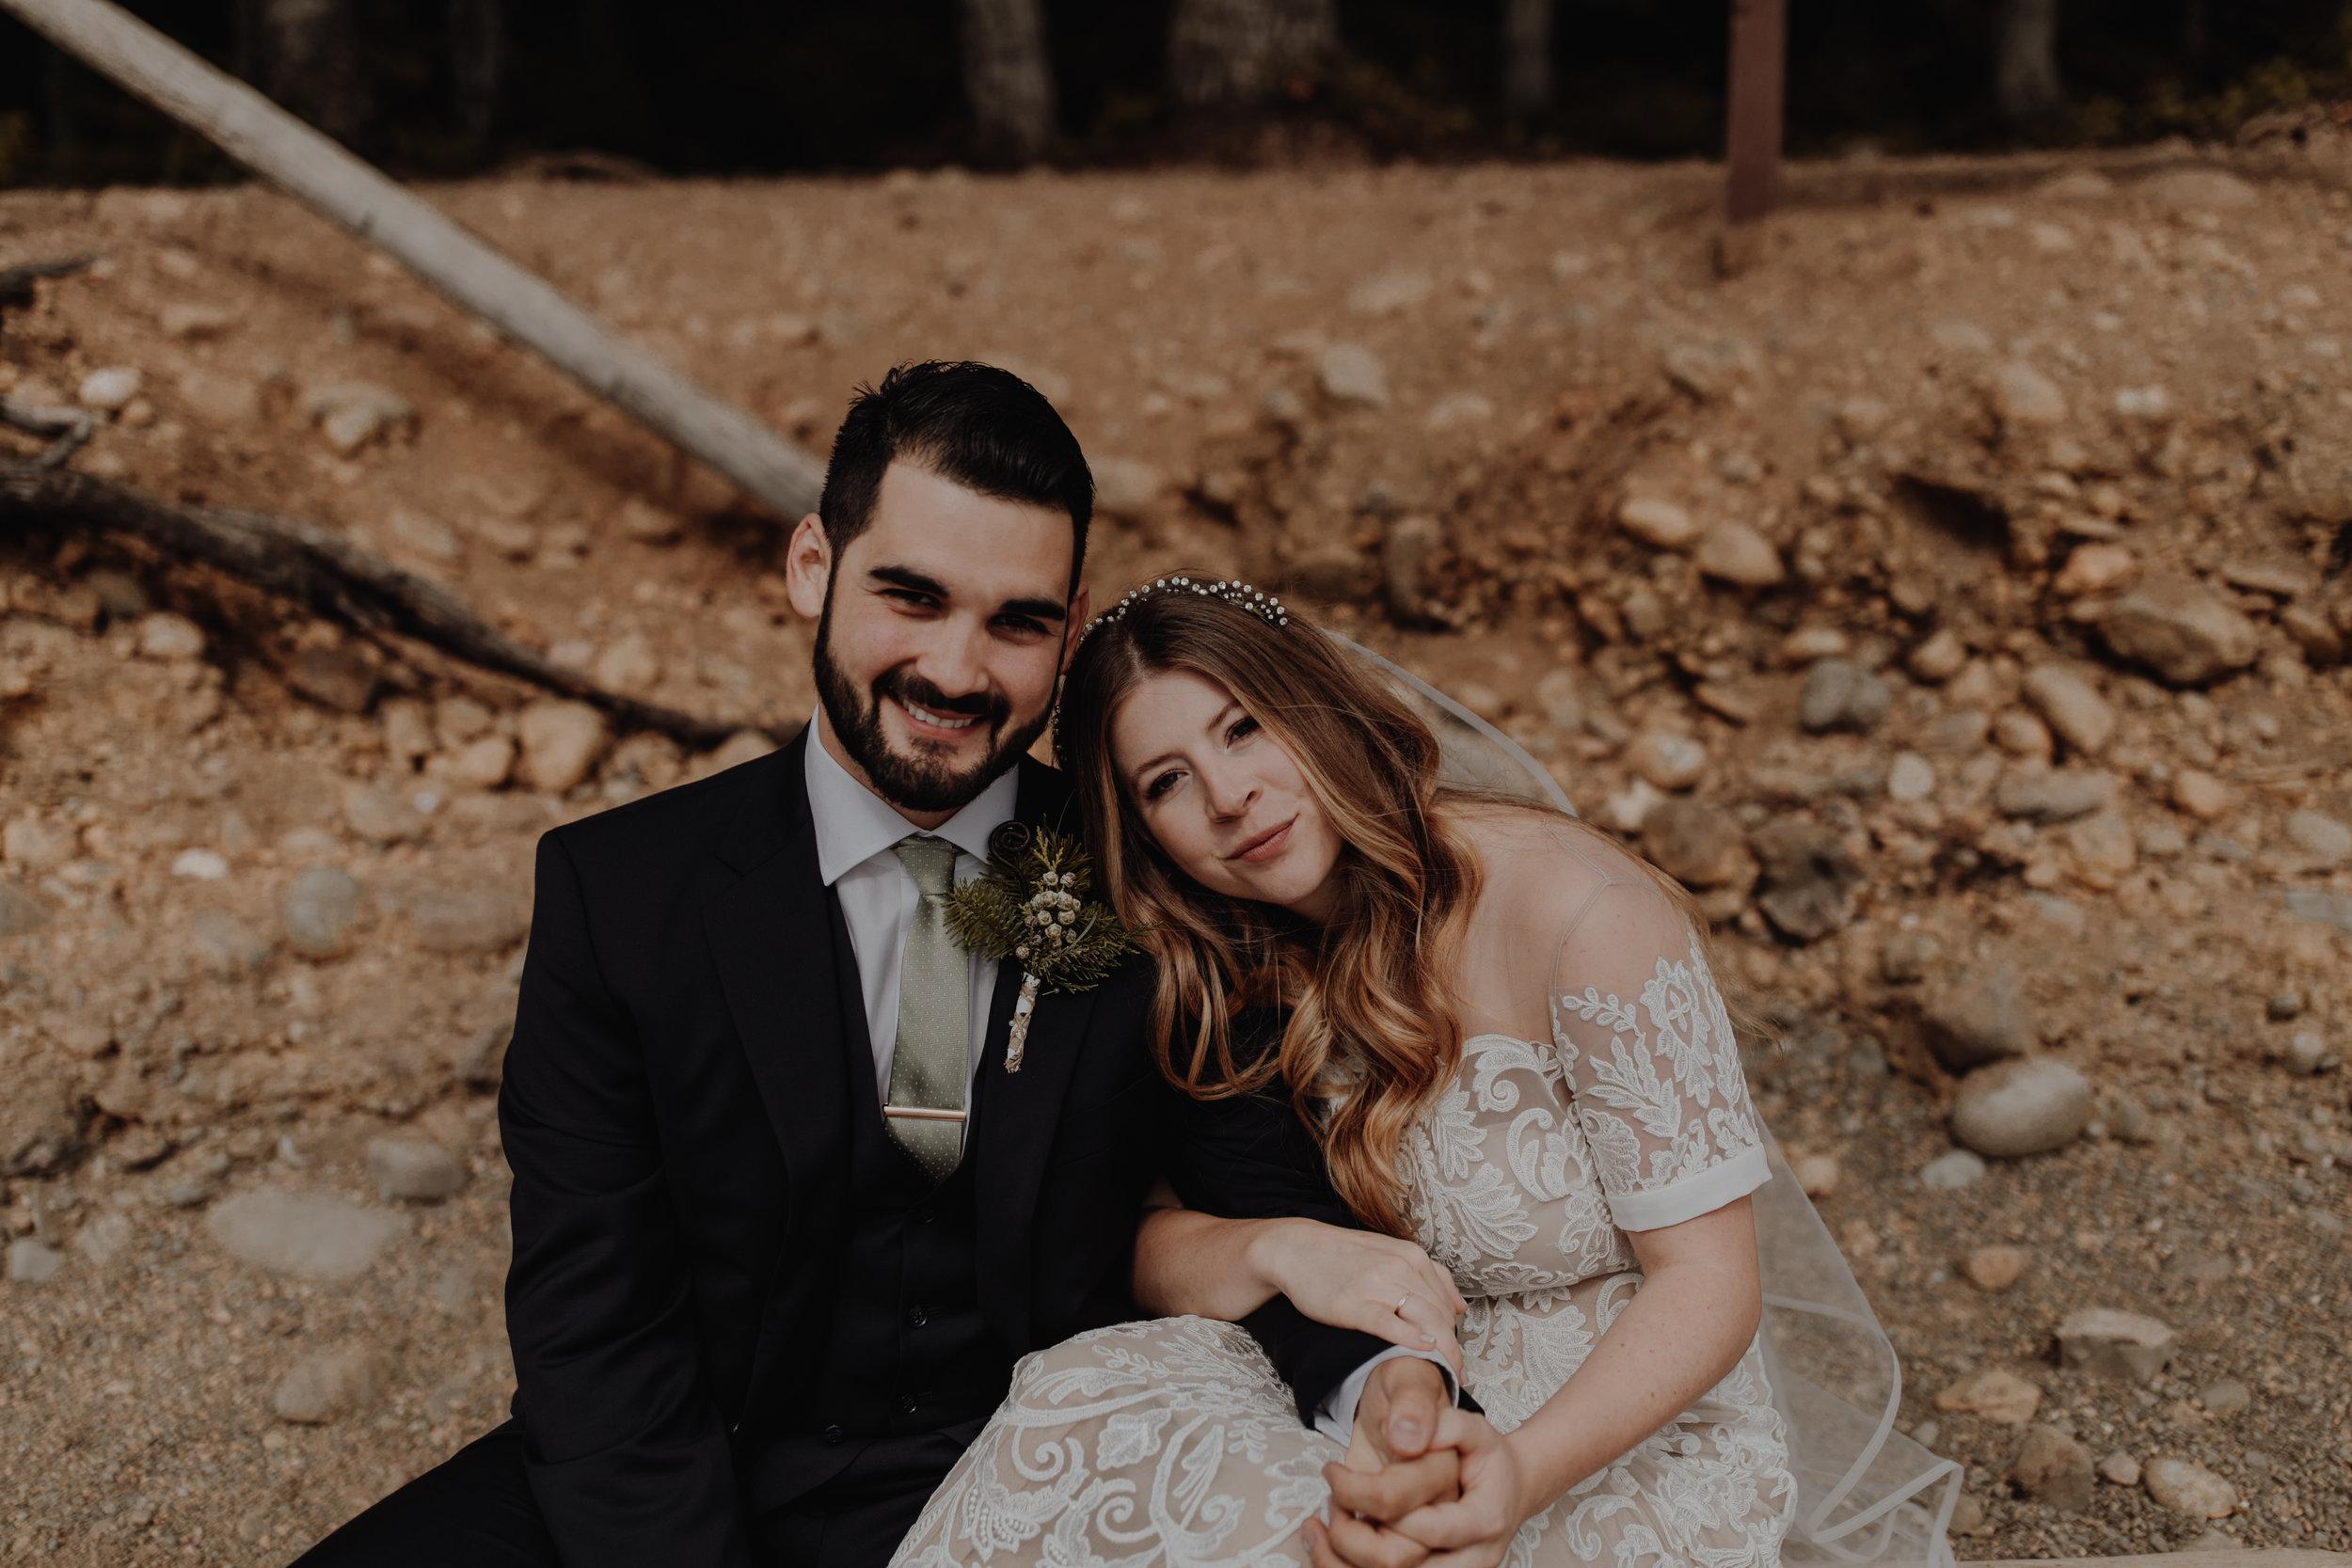 chelsea_jordan_wedding-158.jpg